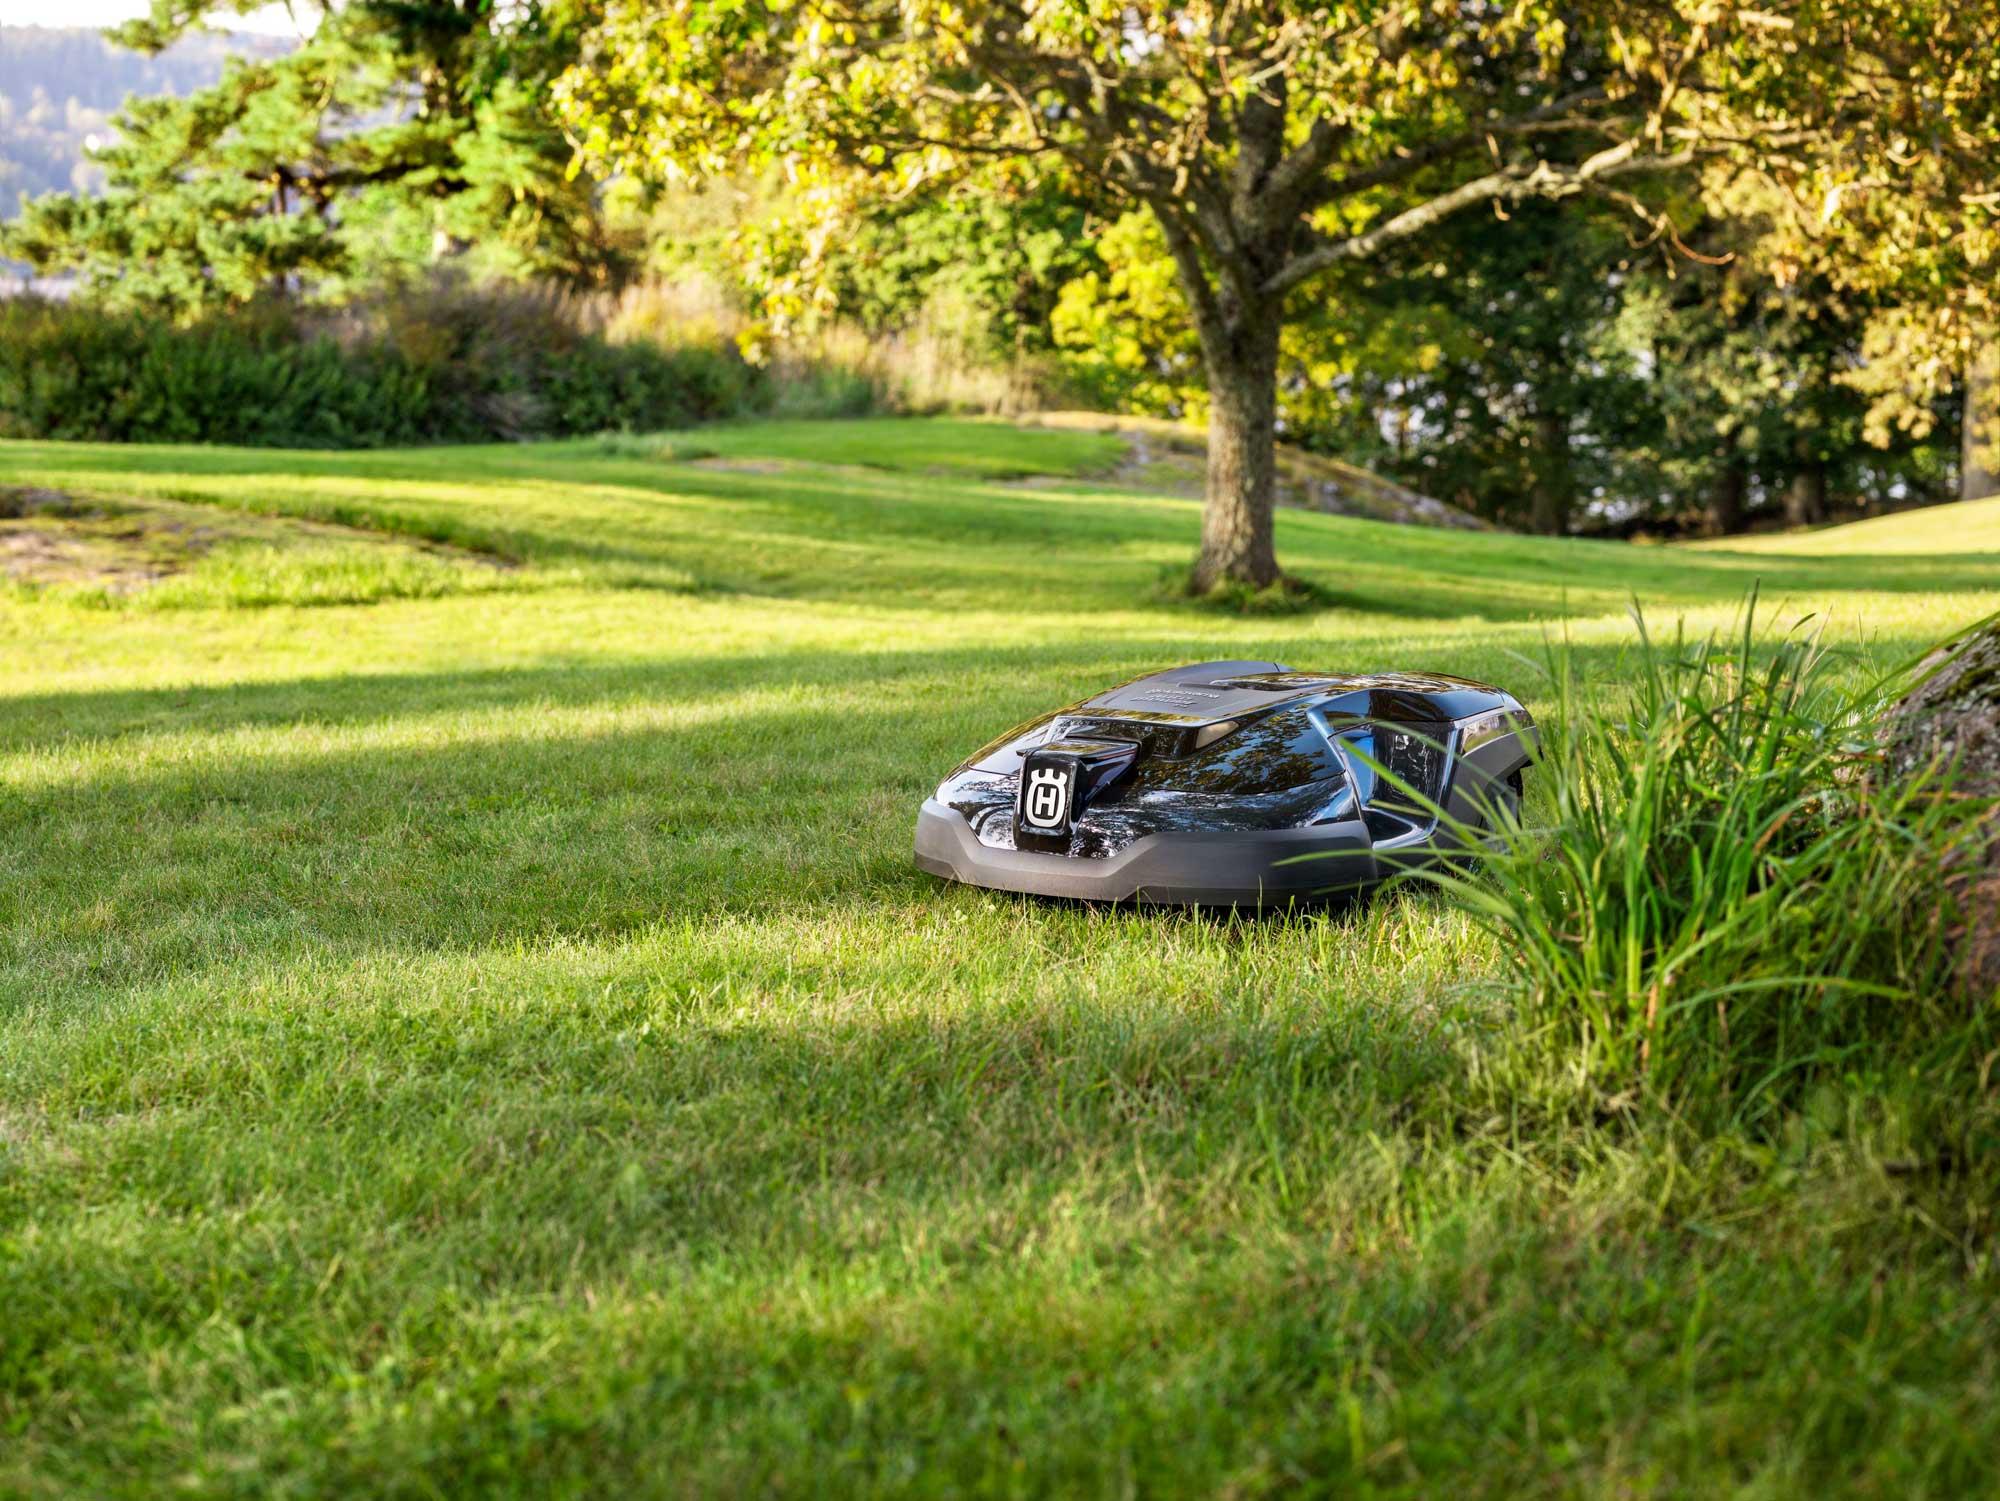 Win-a-Husqvarna-Robotic-Lawnmower_lifestyle